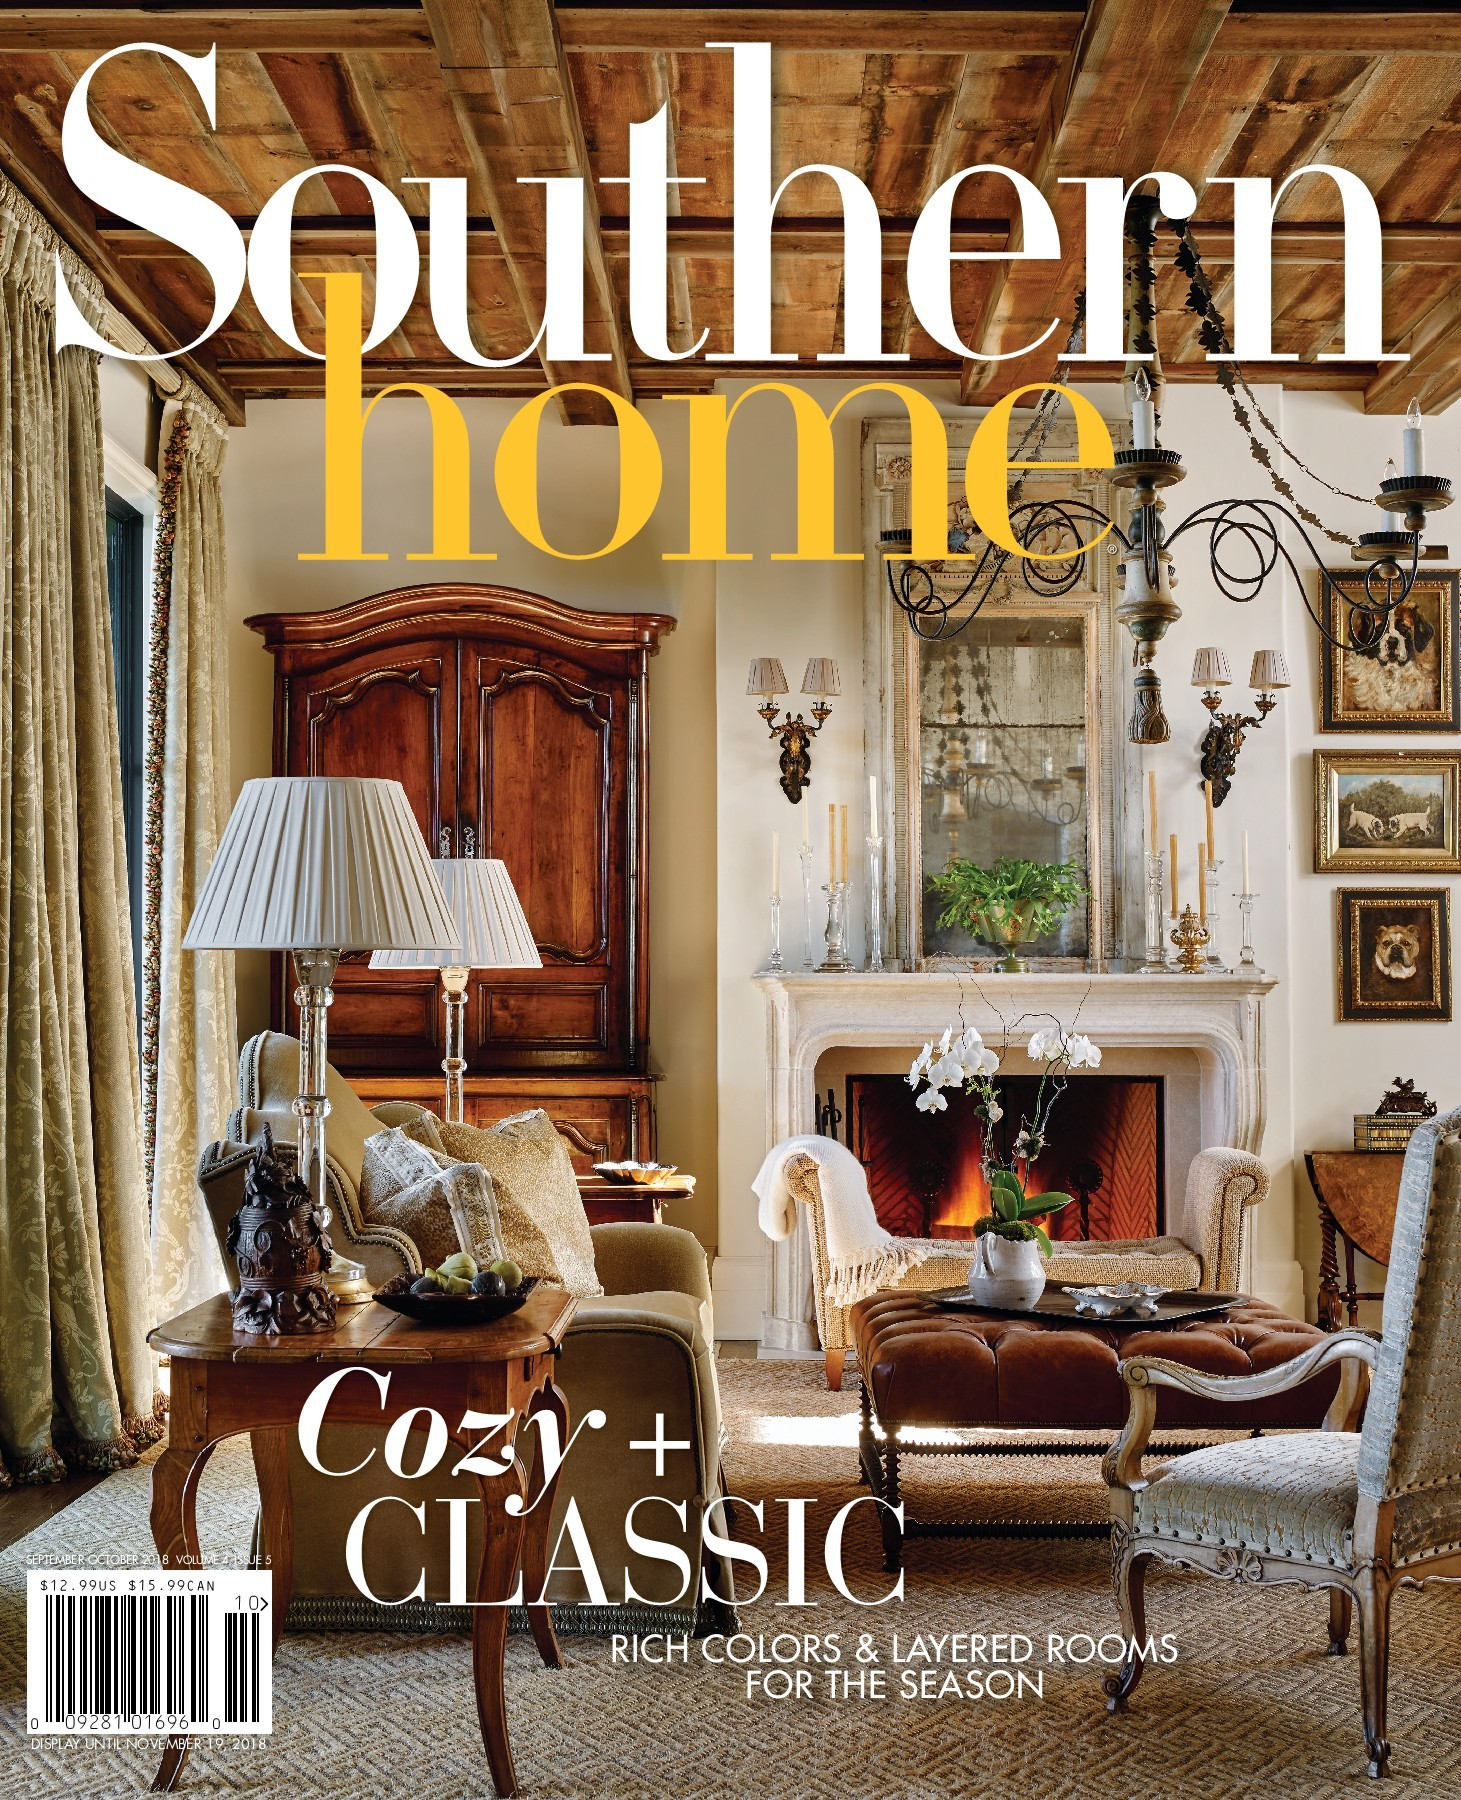 September/October 2018 - Southern Home Magazine